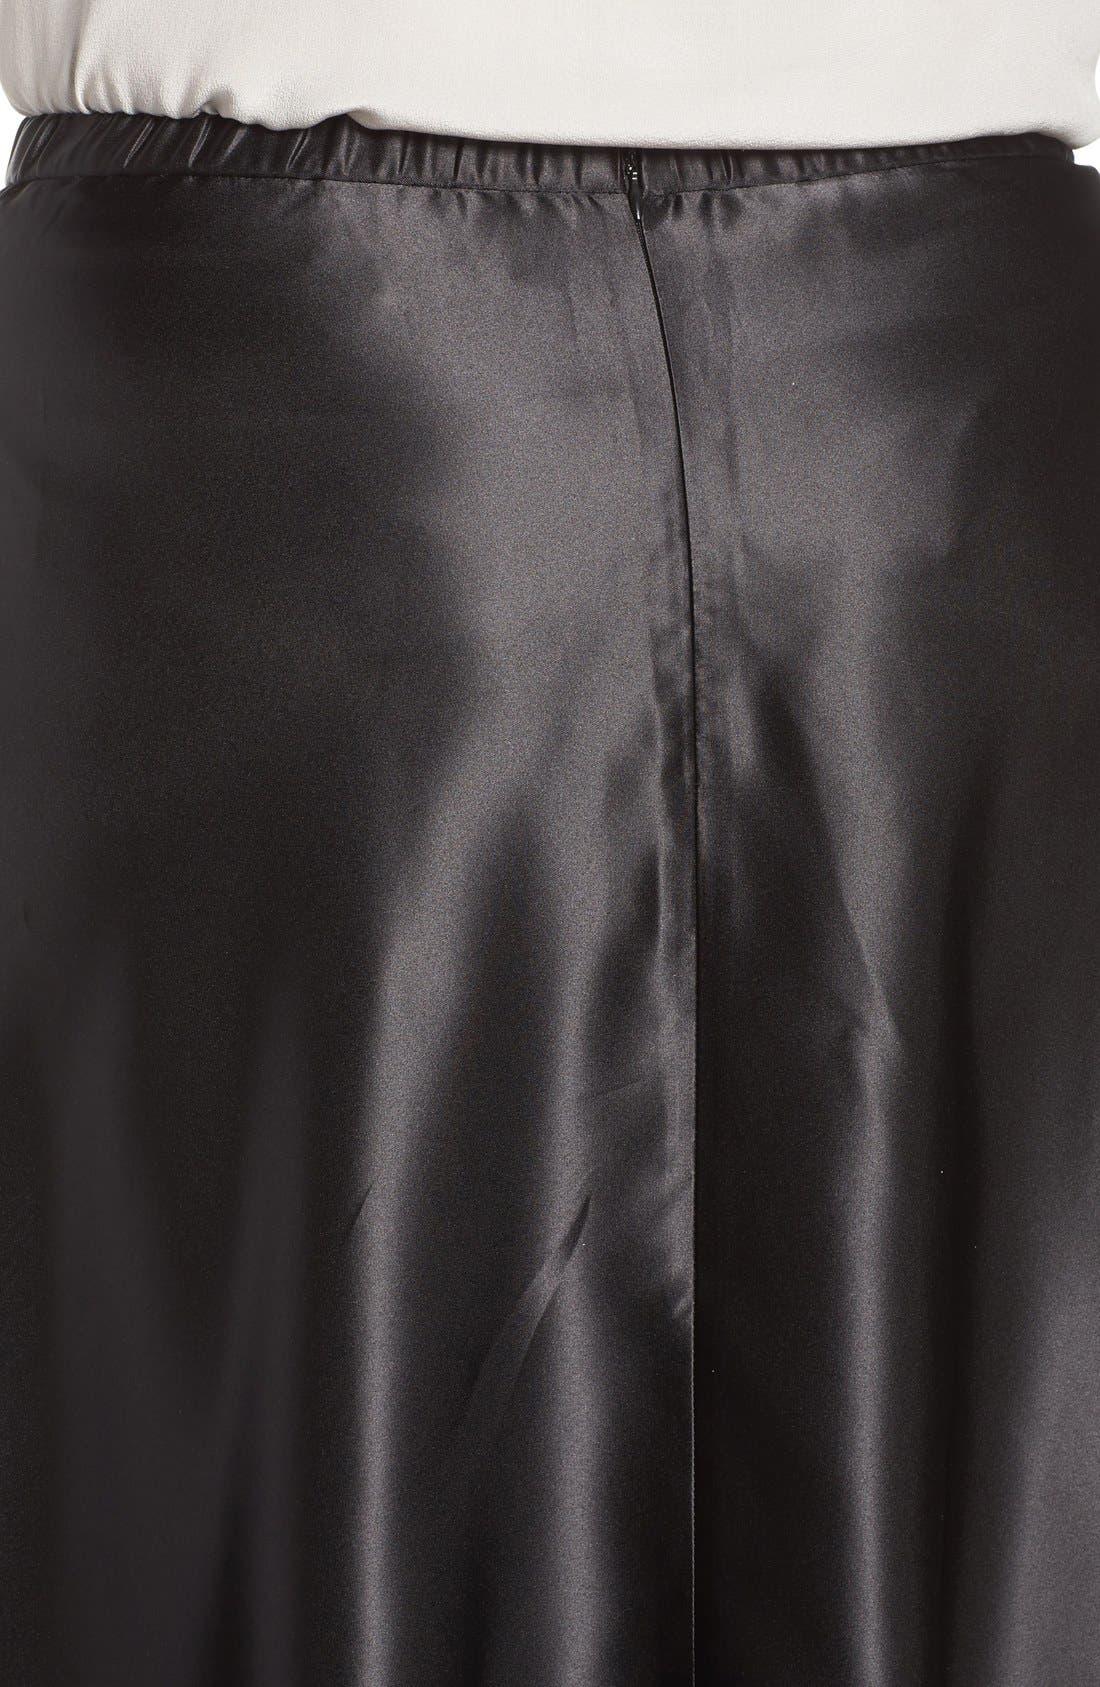 Satin Long Circle Skirt,                             Alternate thumbnail 5, color,